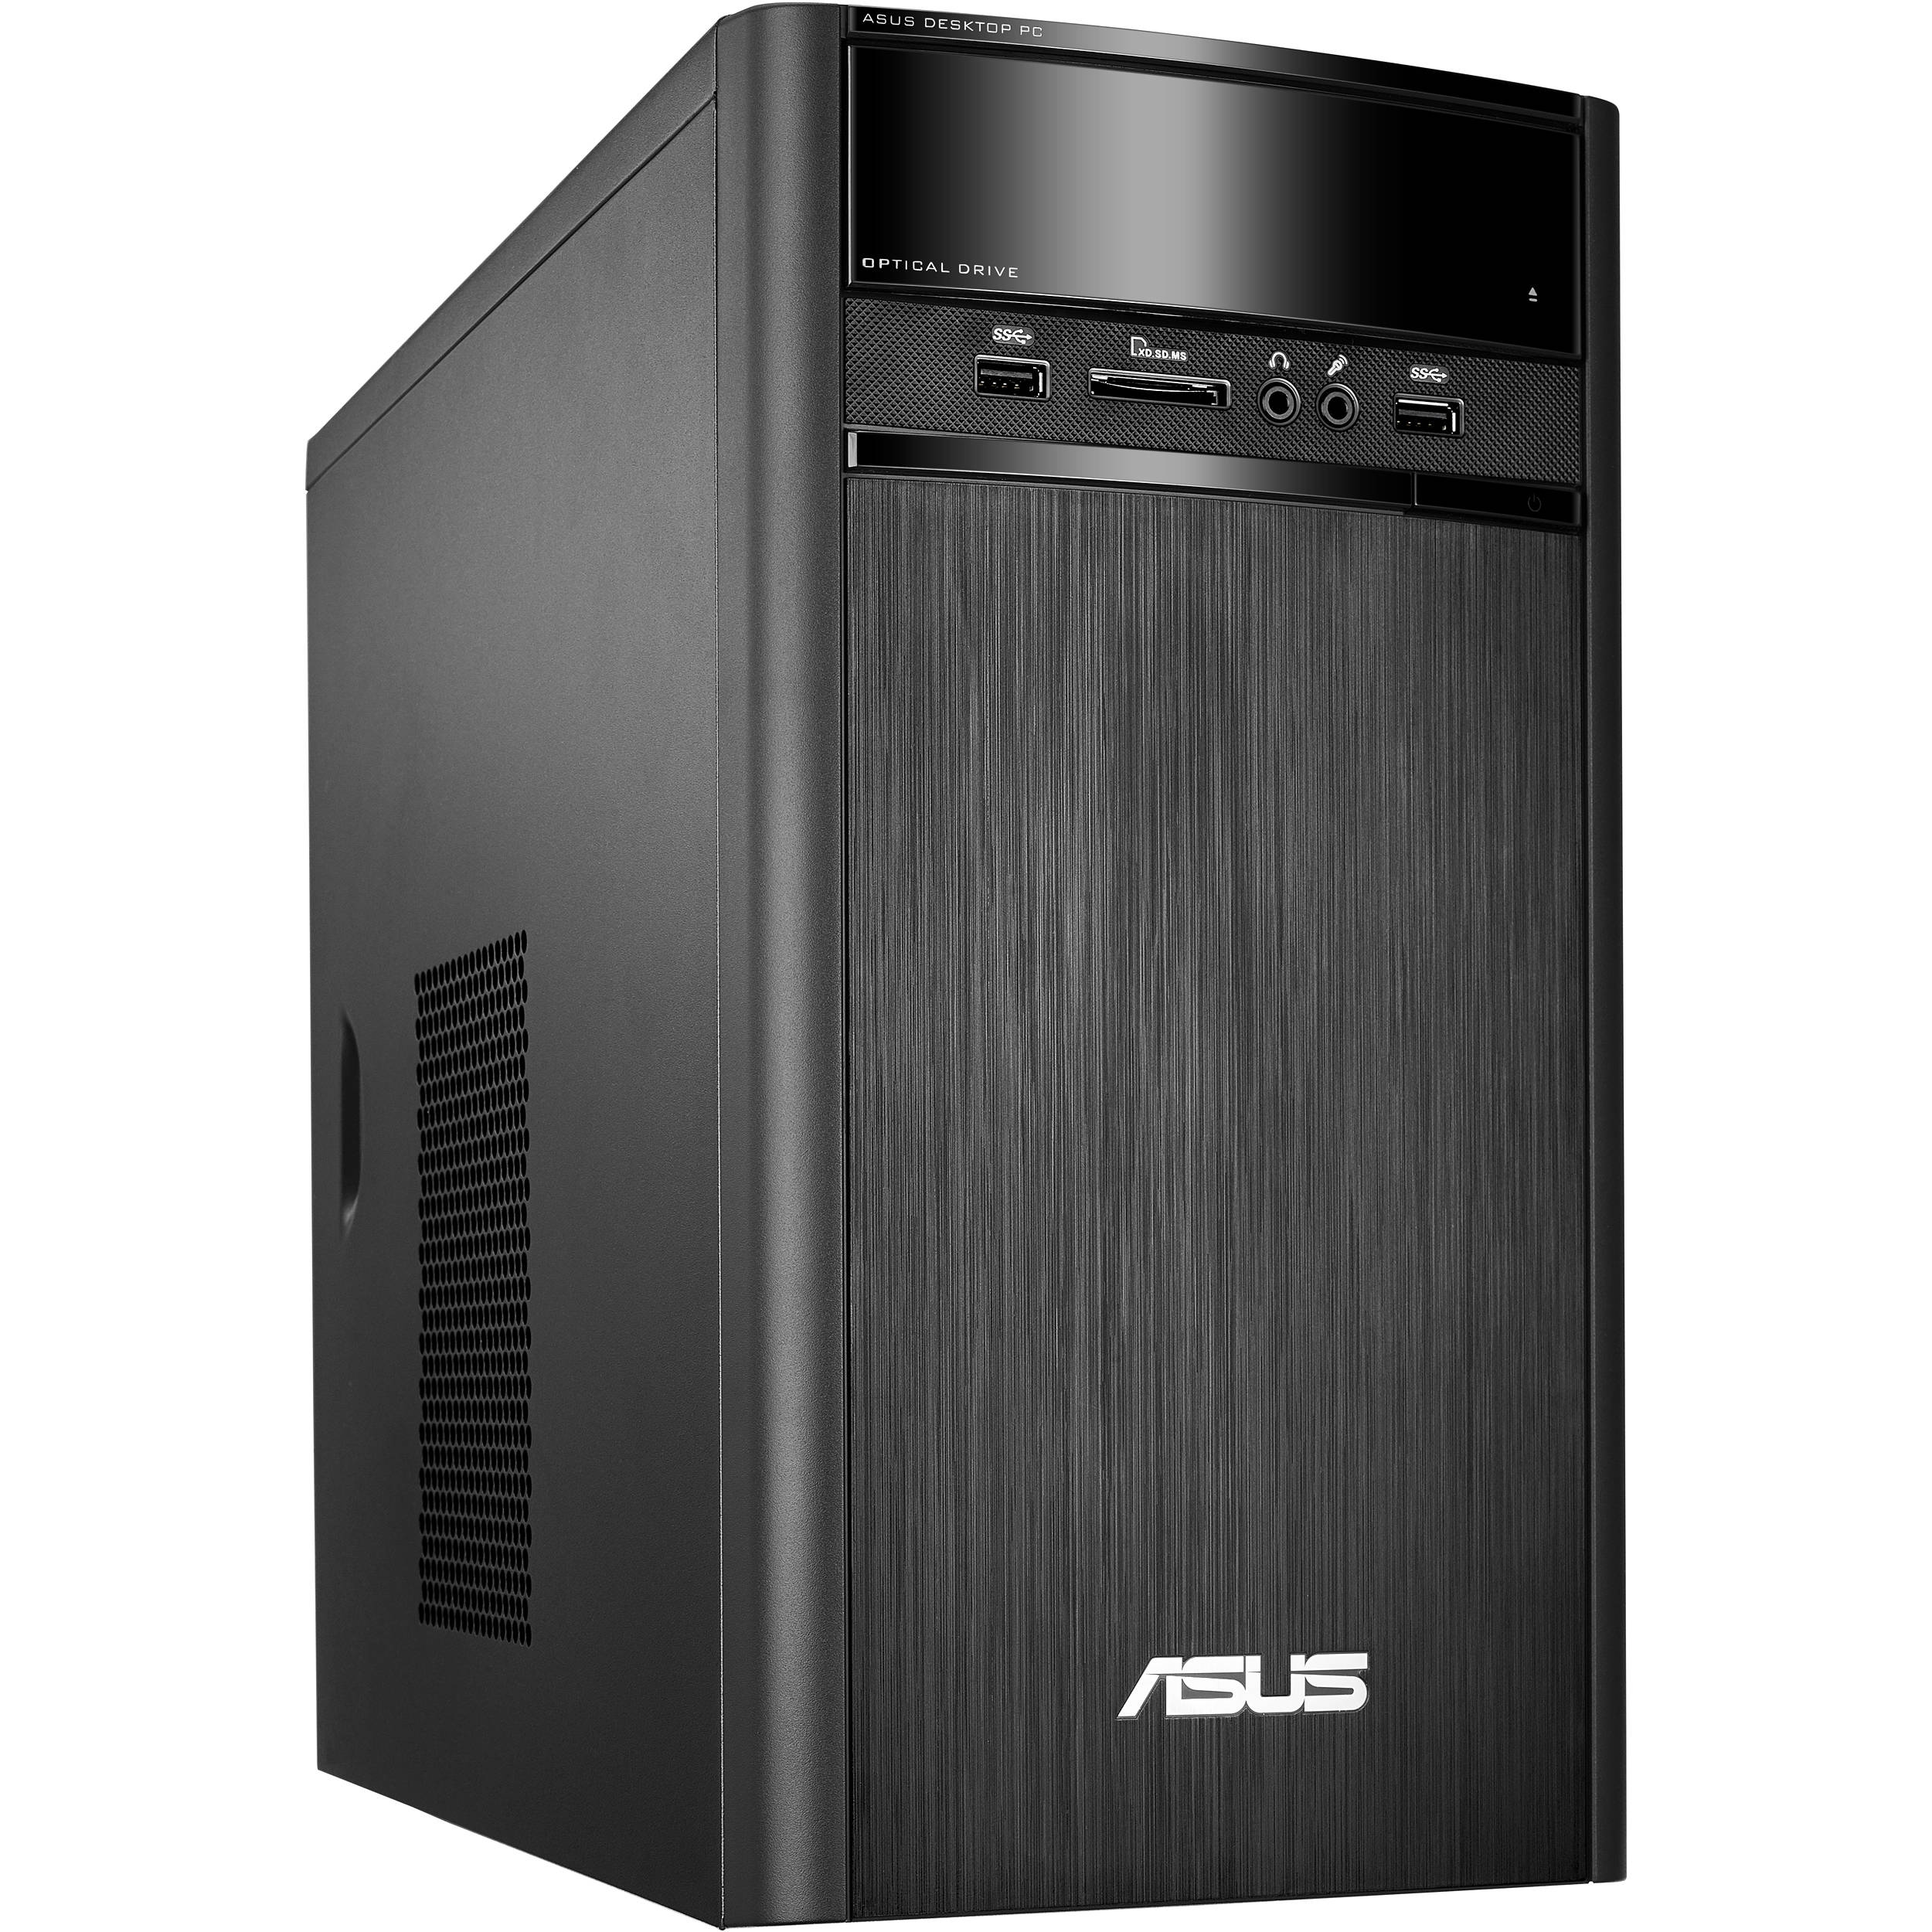 Manufacturer Refurbished - Asus K31CD-AB51 Desktop Intel Core i5-6400 2.7GHz 8GB 1TB Windows 10